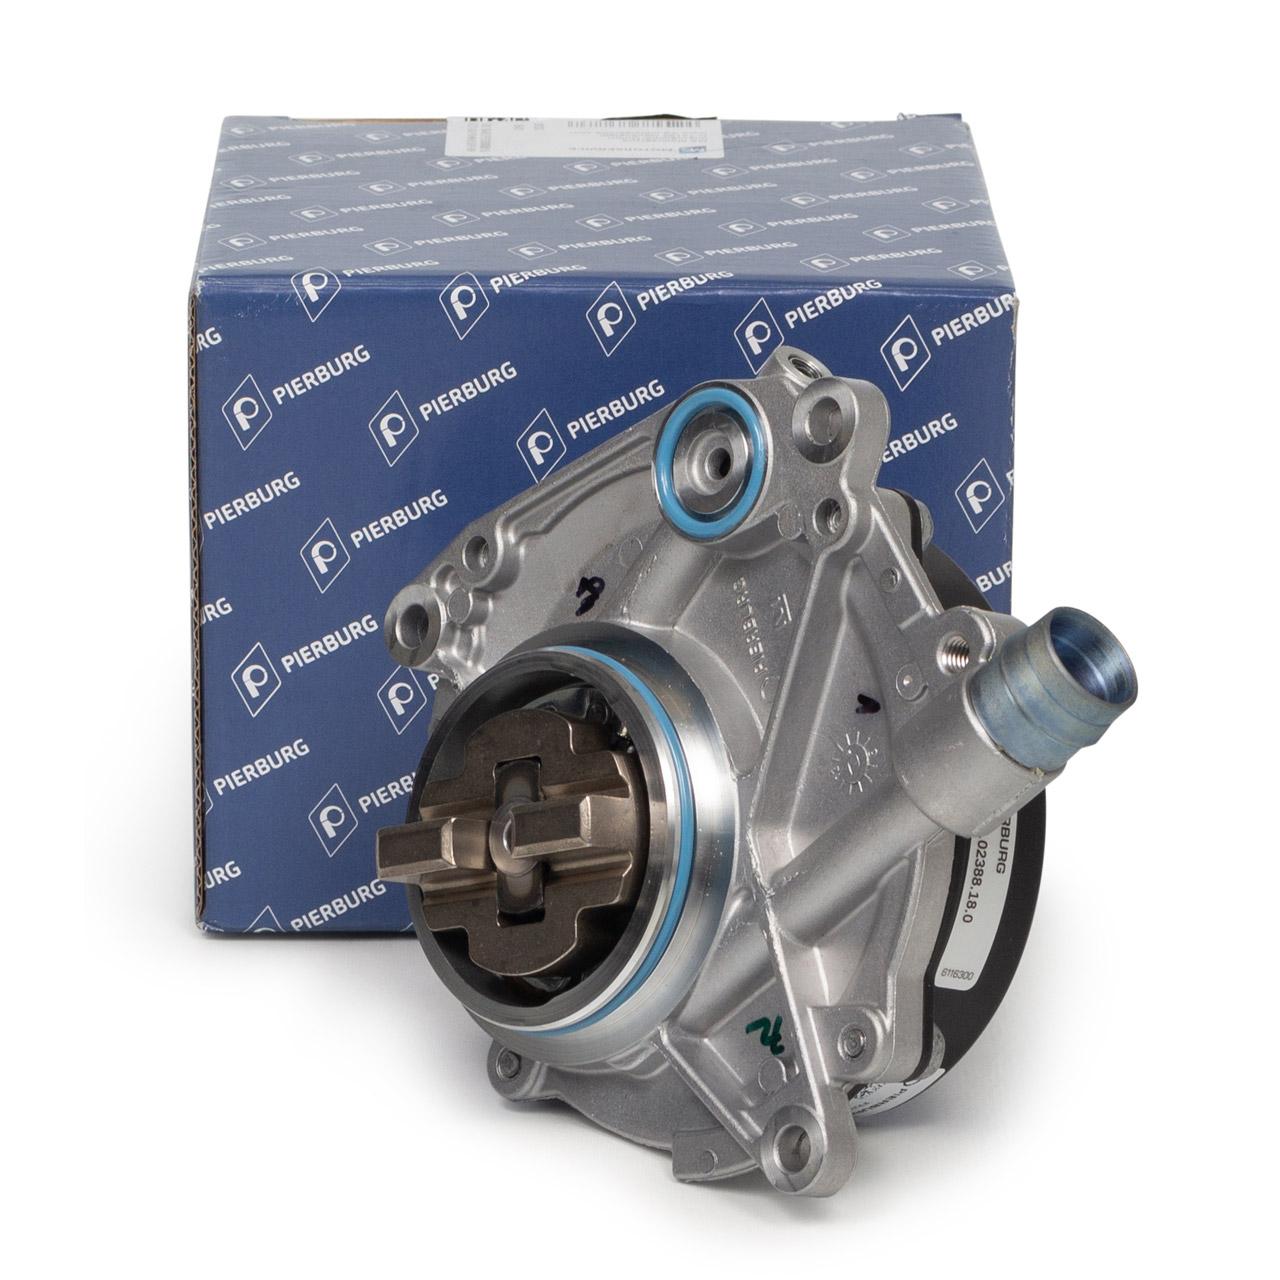 PIERBURG Vakuumpumpe Unterdruckpumpe PORSCHE 911 (997) Boxster Cayman 987 2.9 9A111009006